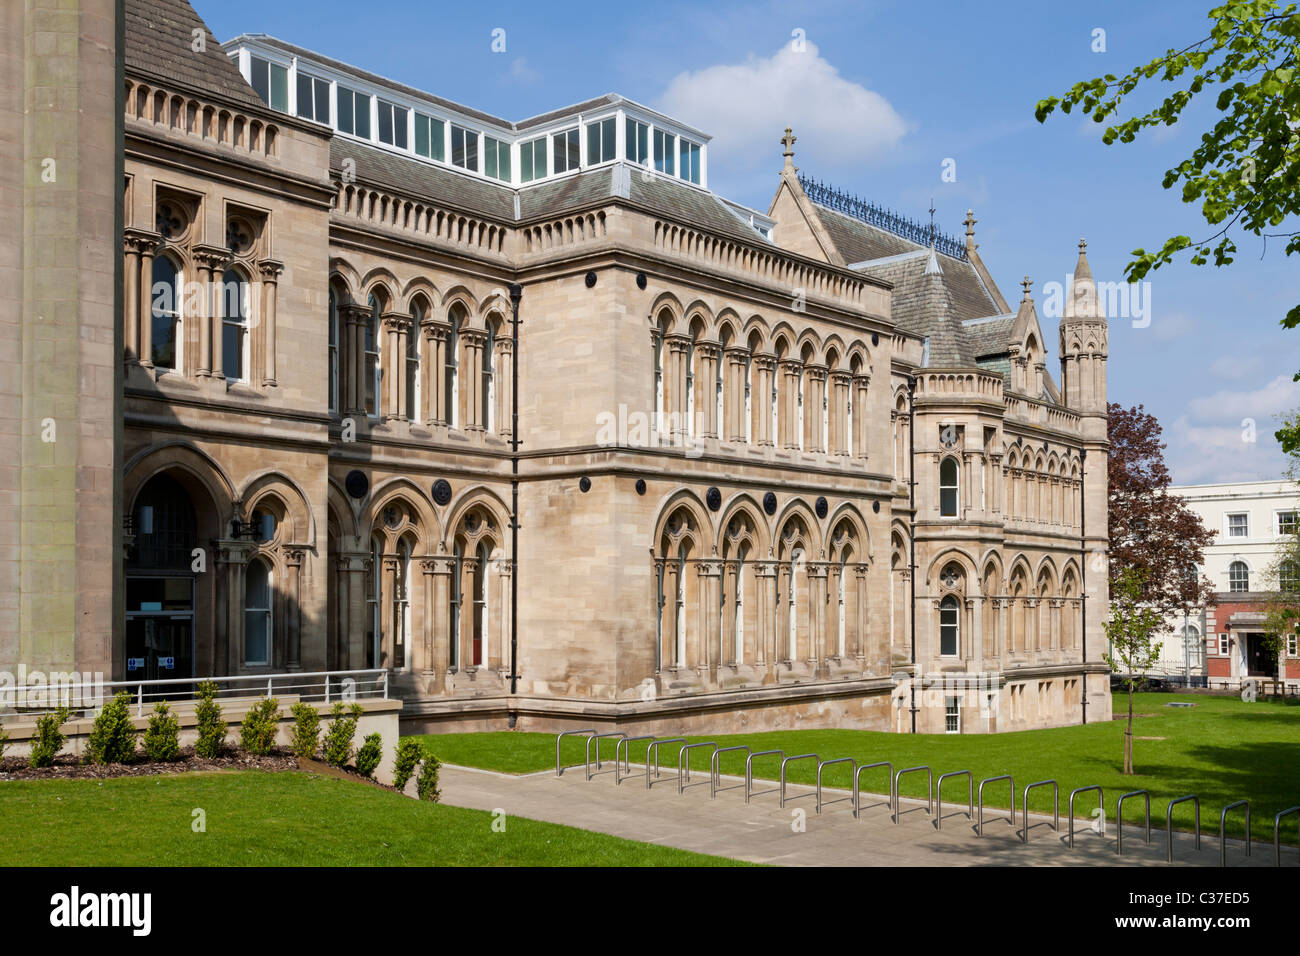 Newton und Arkwright Gebäude Nottingham Trent University, Nottingham, Vereinigtes Königreich Stockbild